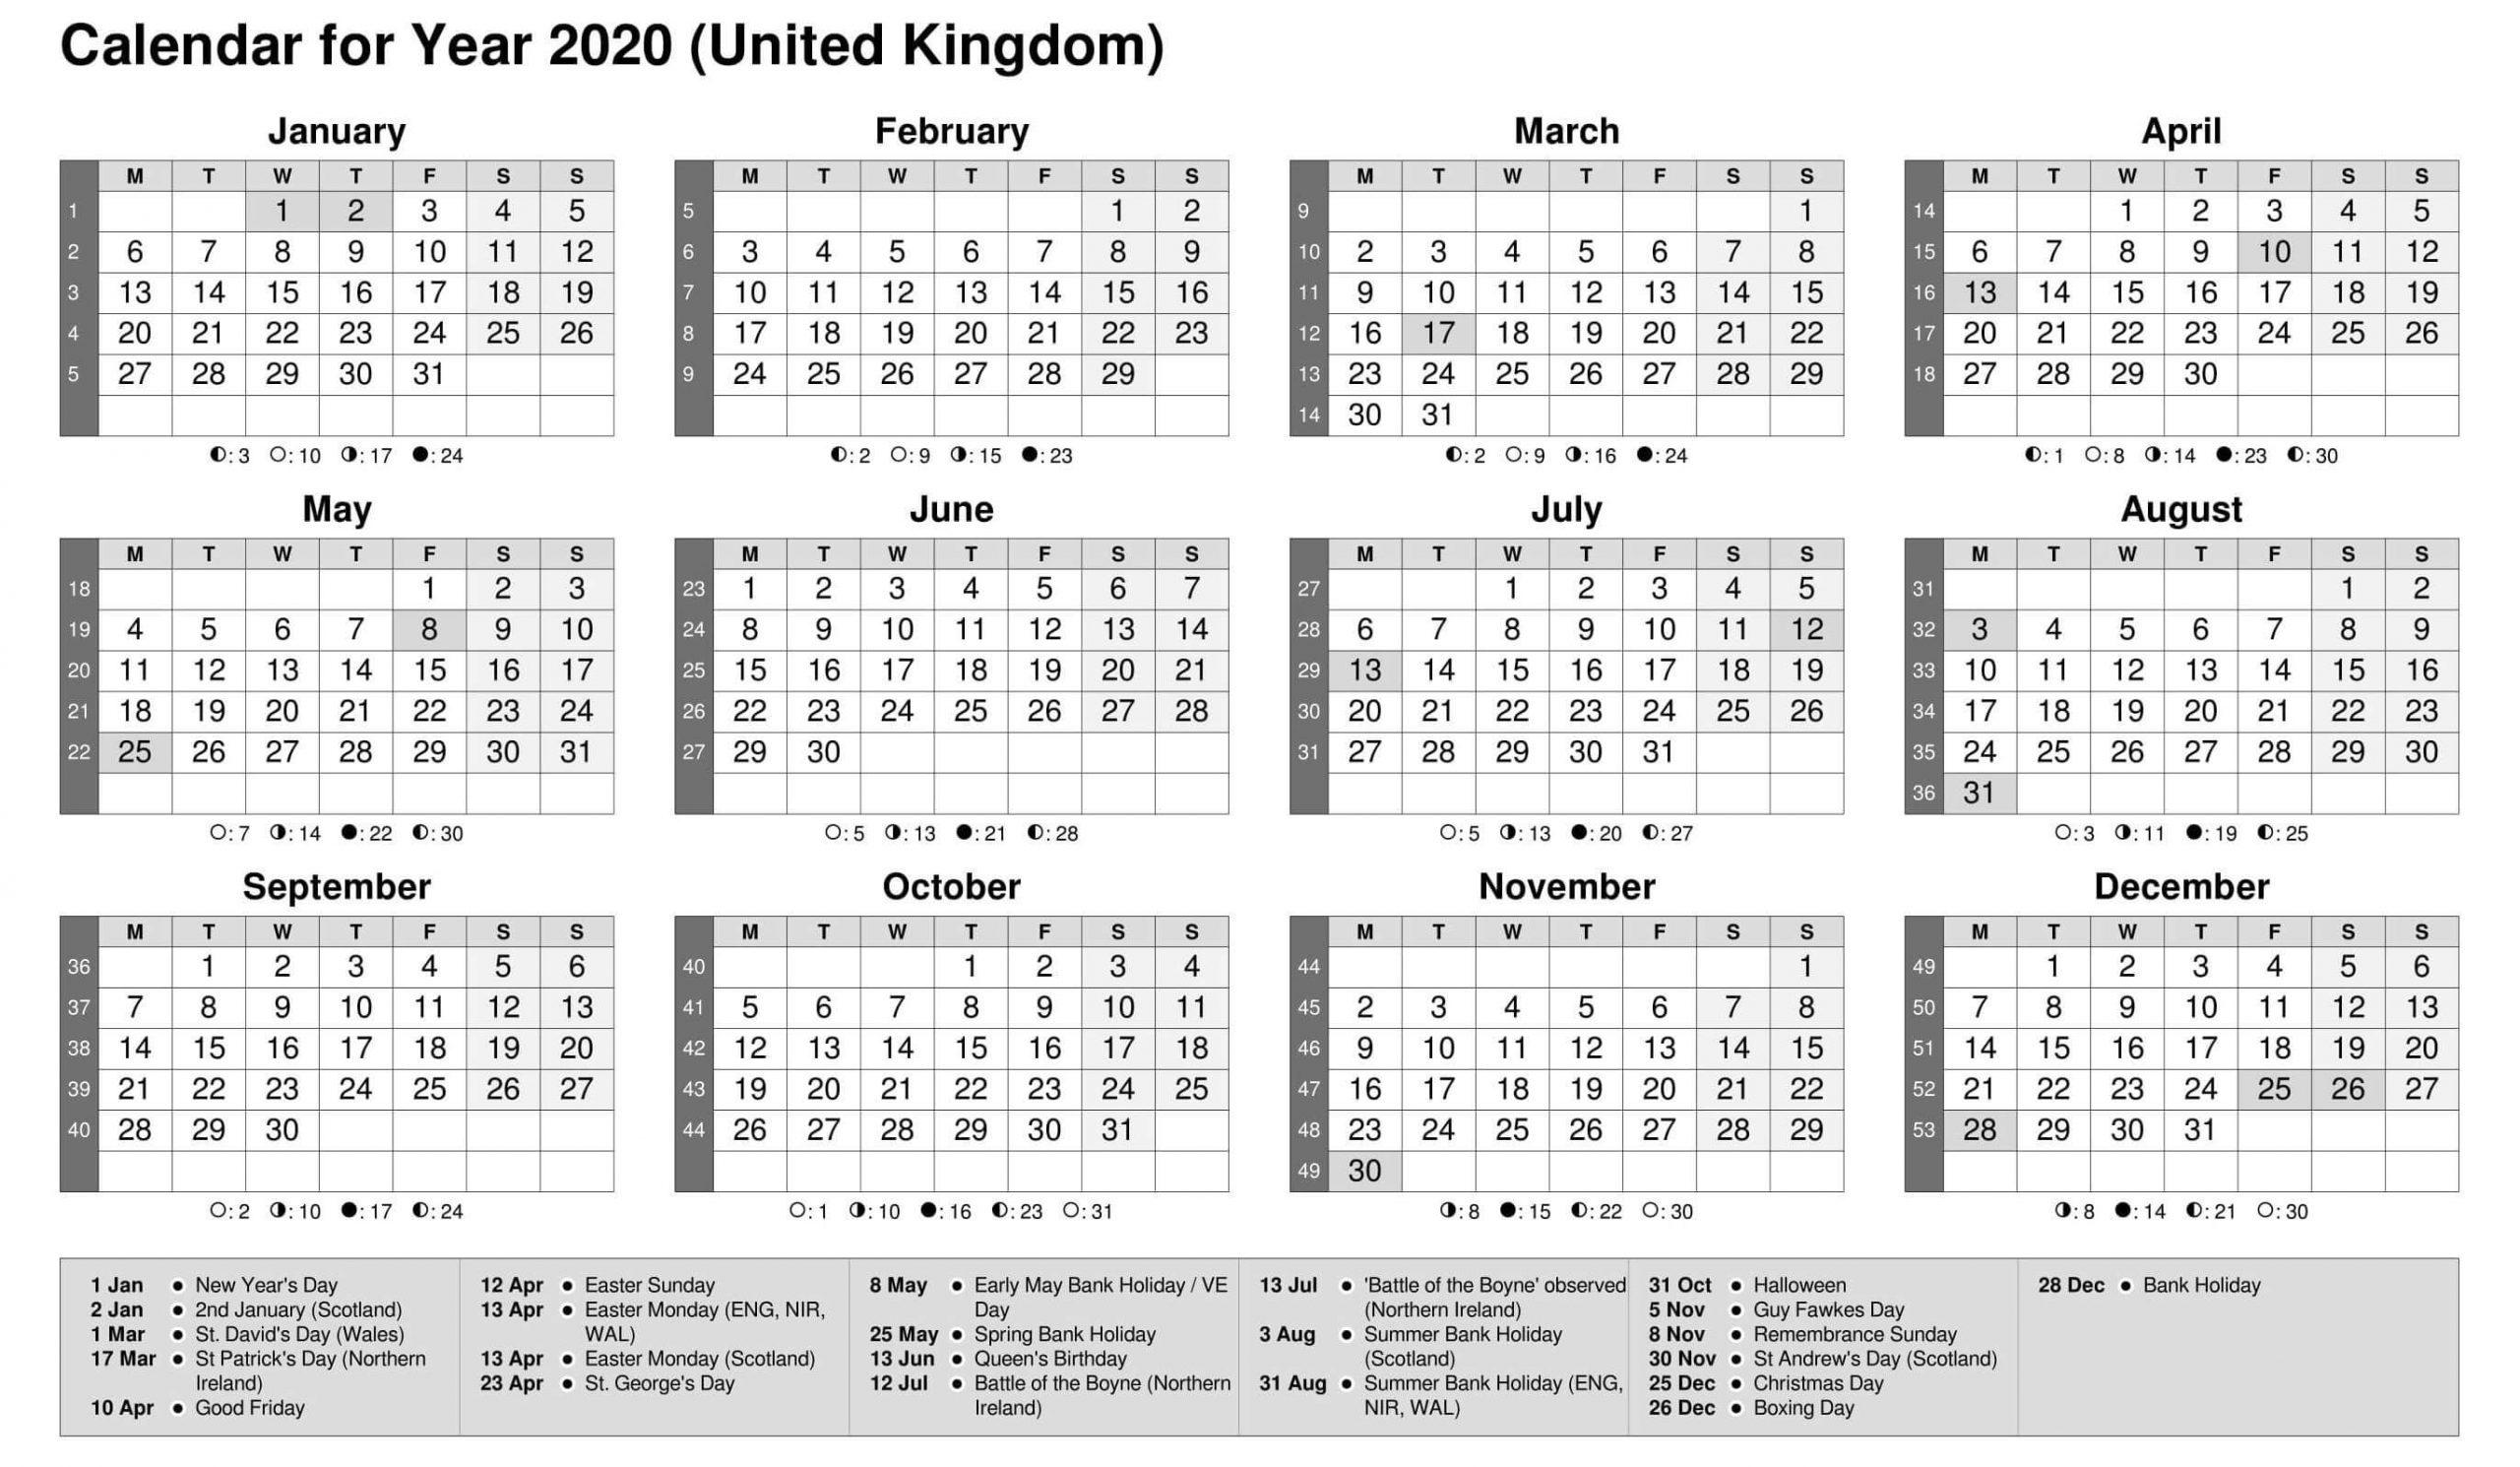 Fiscal Year 2020 Calendar UK